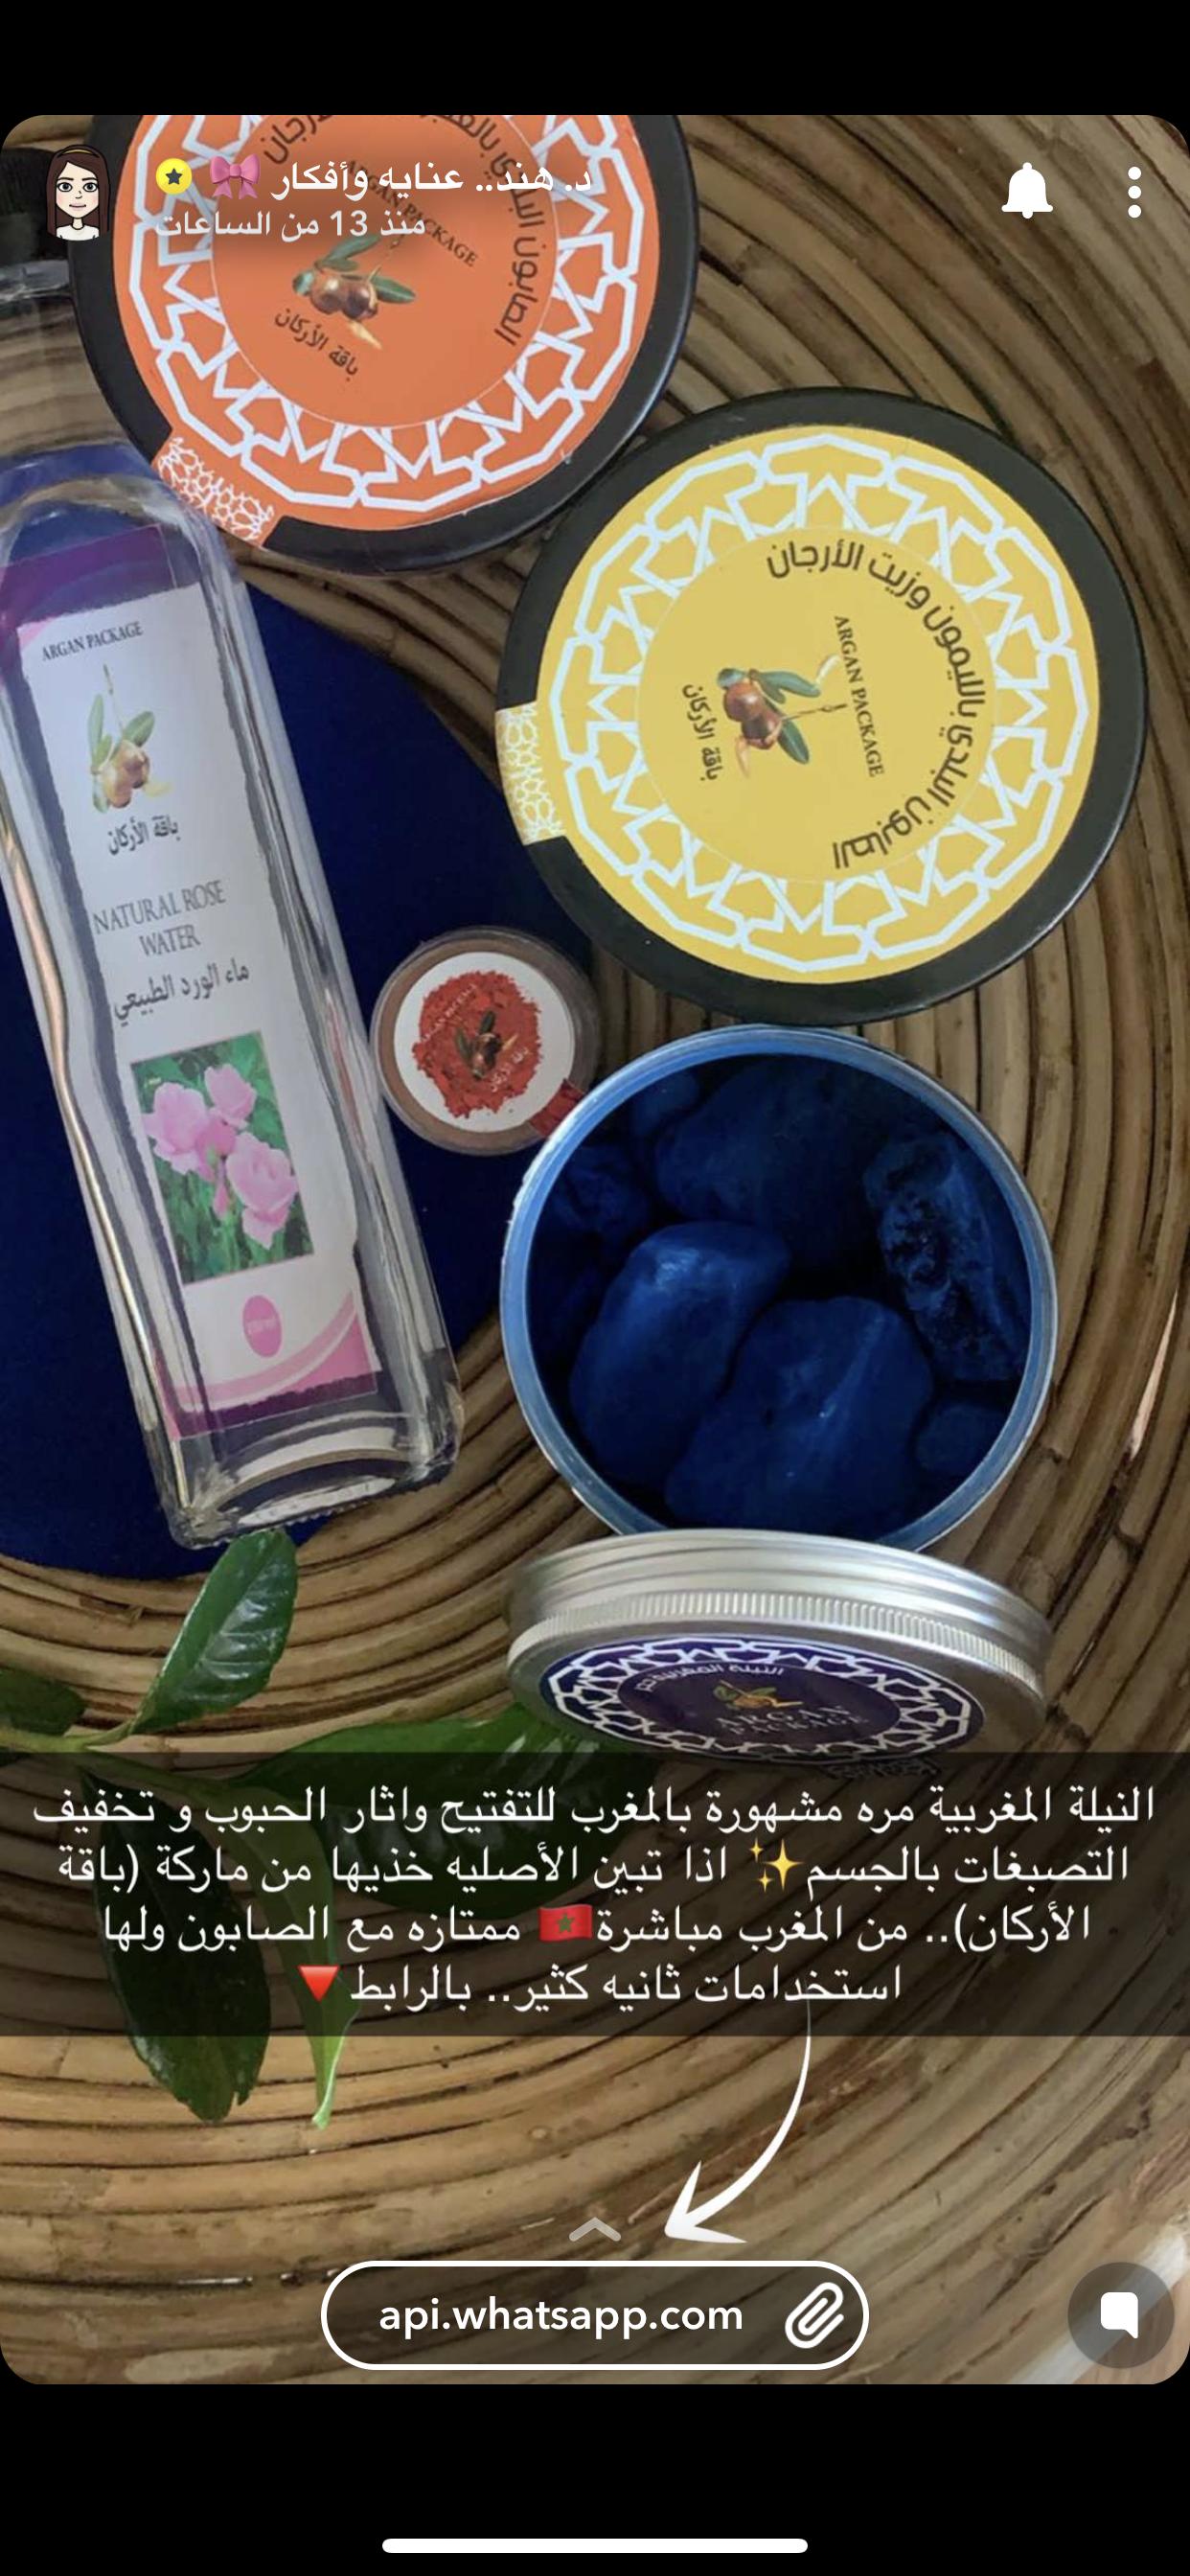 Pin By Alaa On طريقة الحمام المغربي Natural Rose Water Rose Water Packaging